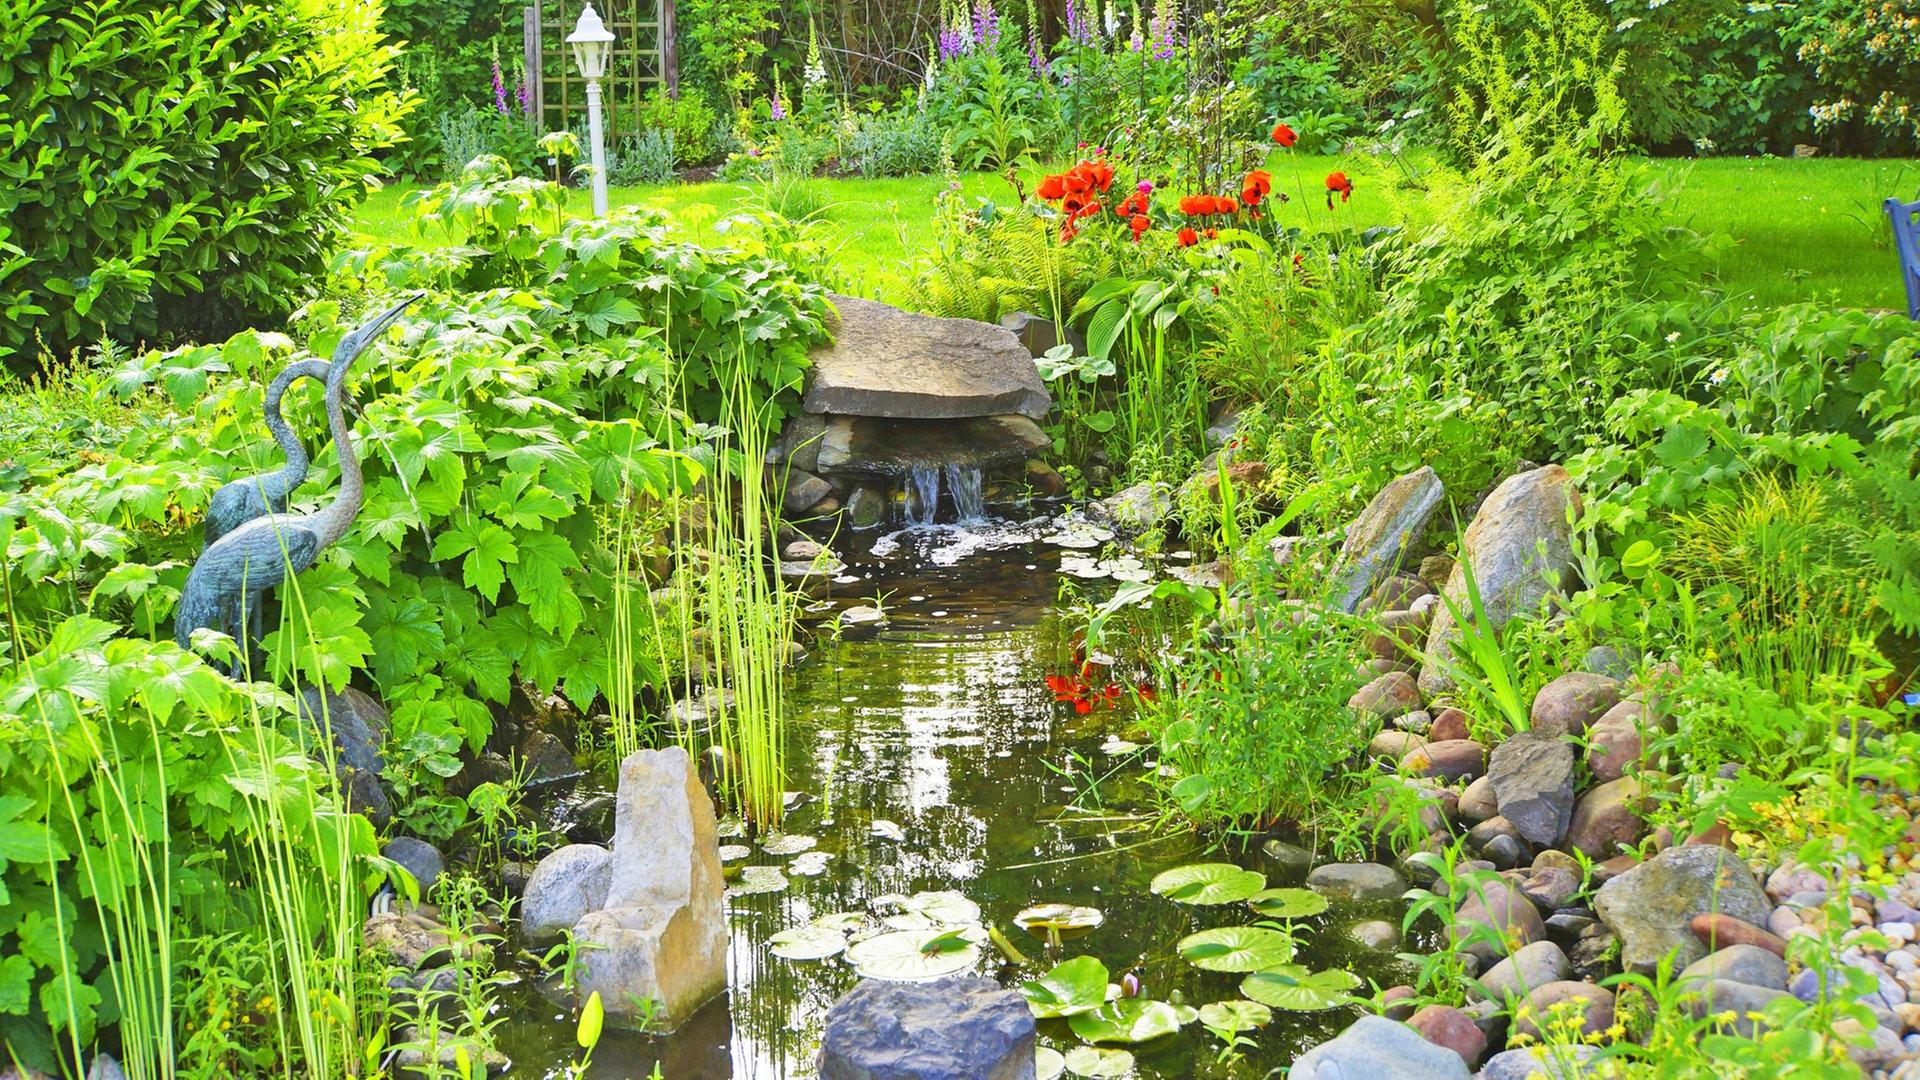 Gartenteich Im Fruhling Reinigen Und Pflegen Ndr De Ratgeber Garten